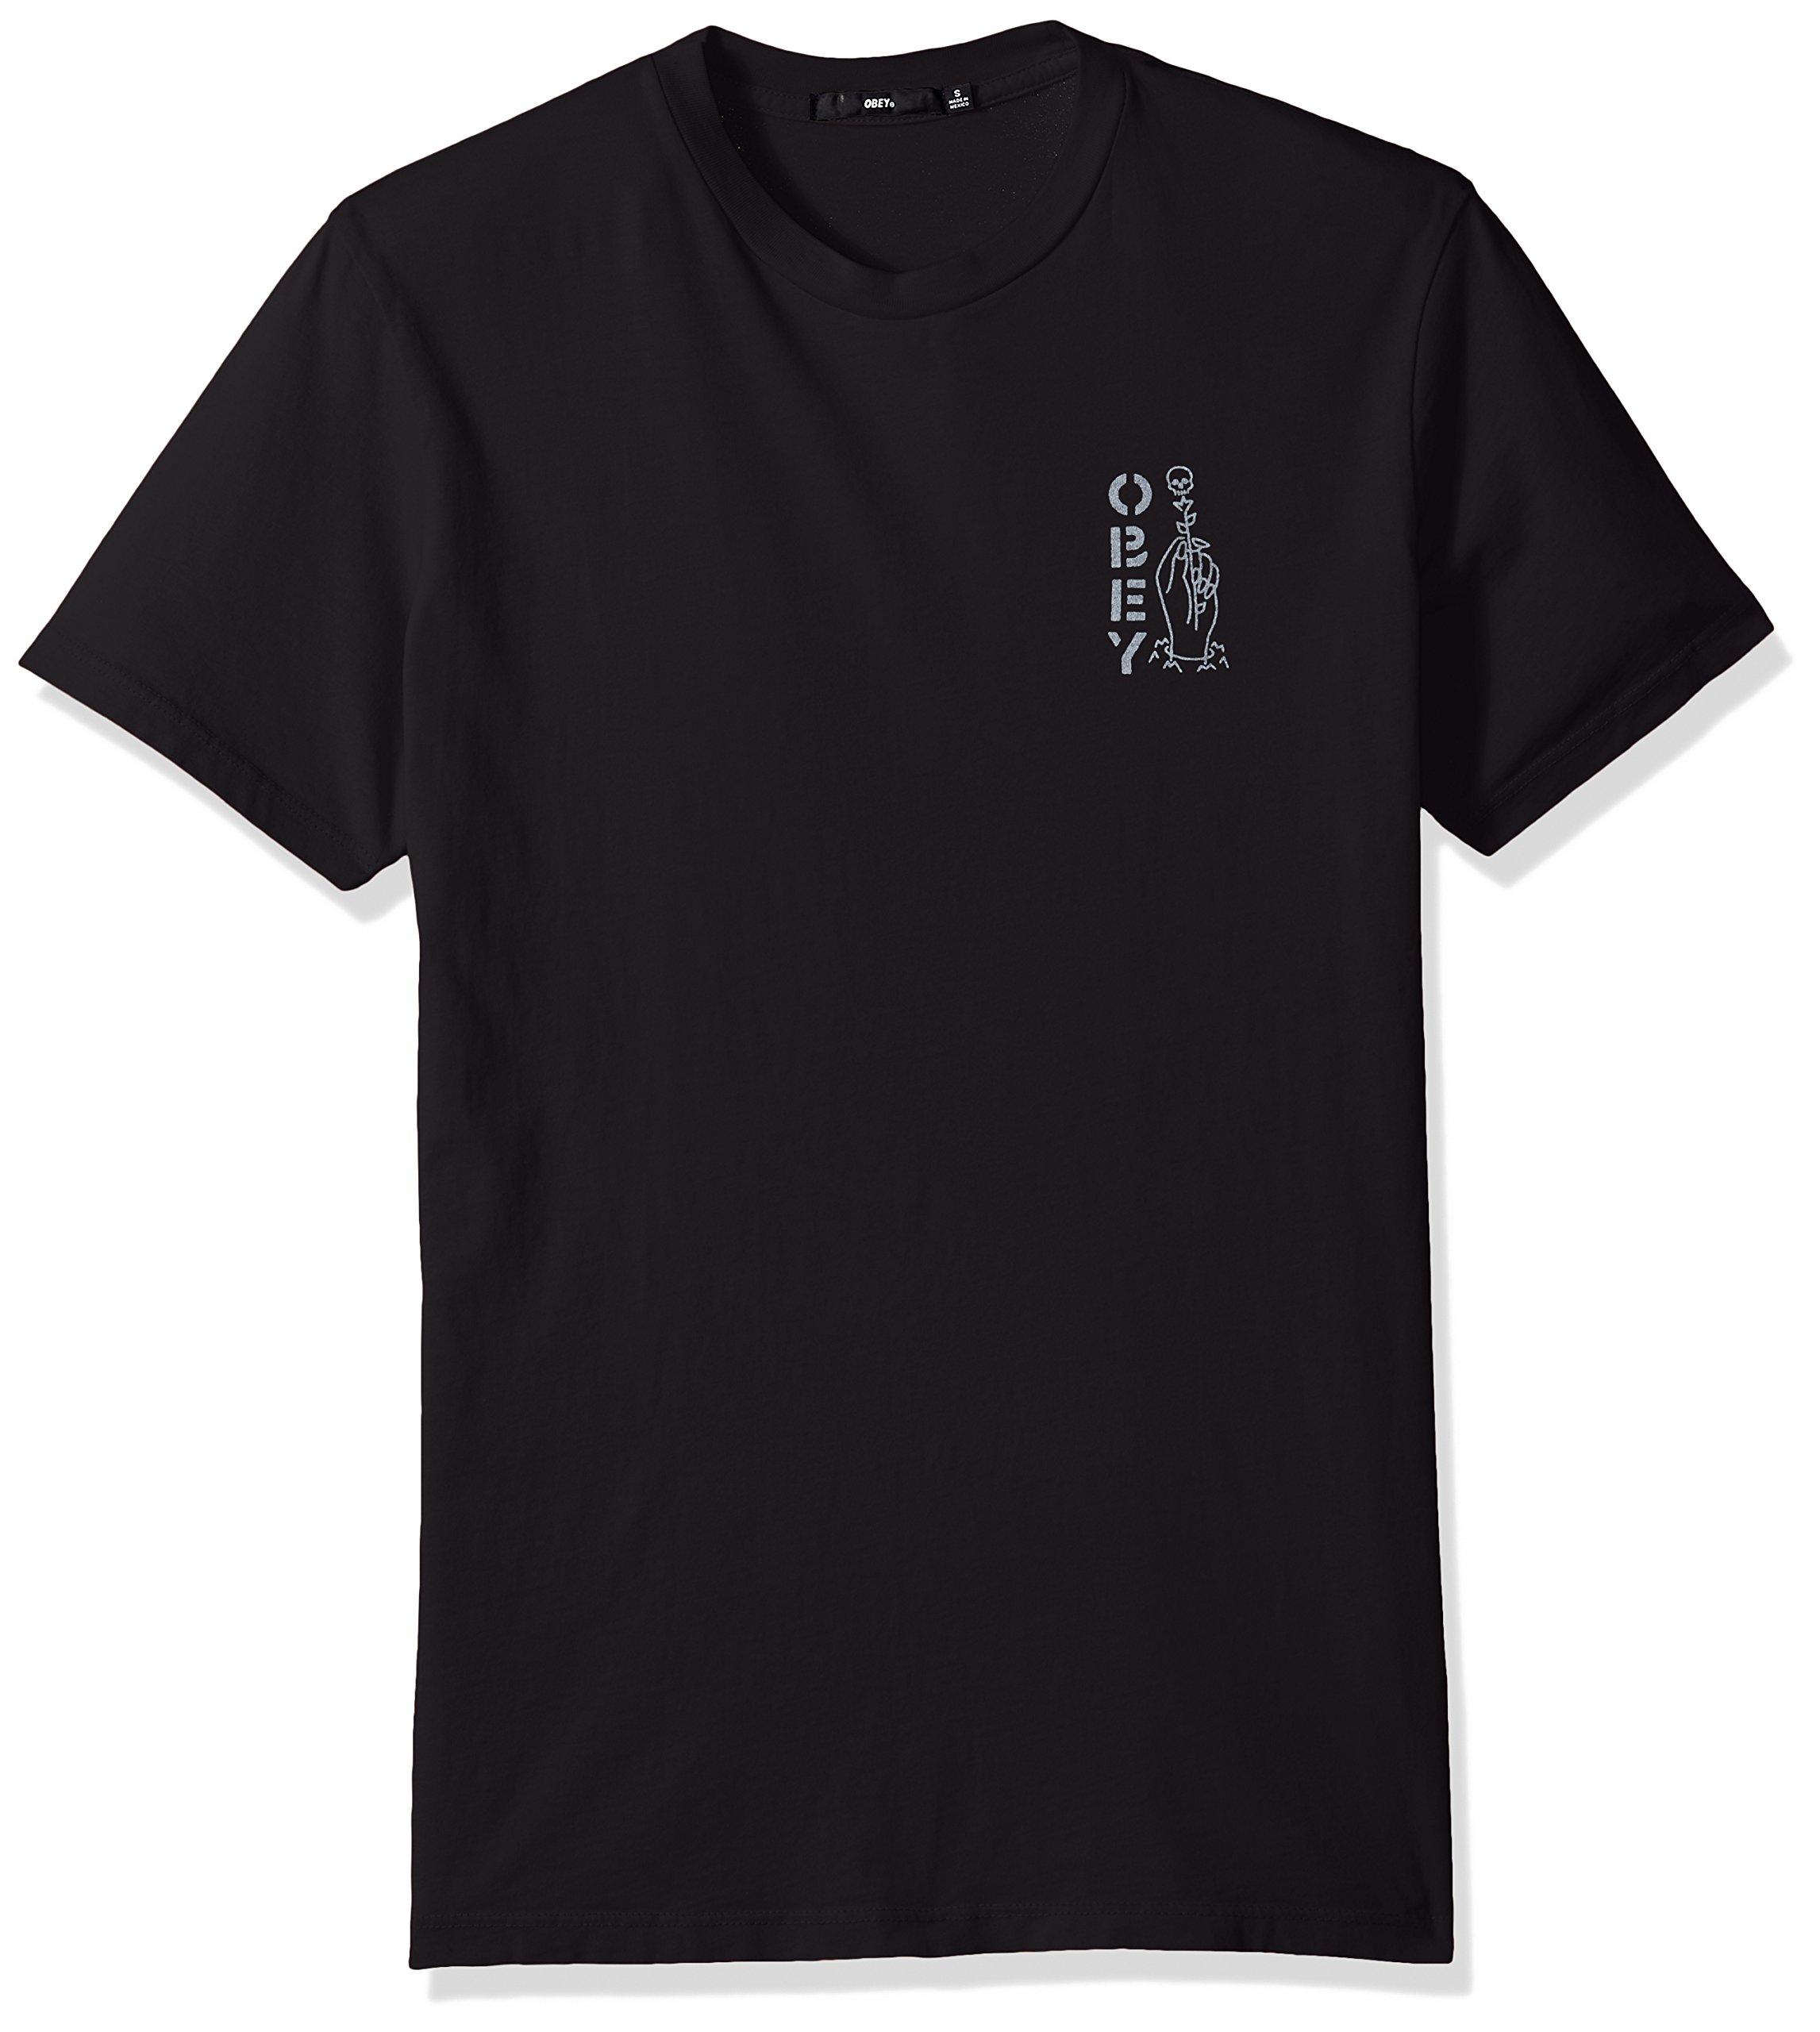 Obey Men's Till Death Crewneck T-Shirt, Limo Black, L